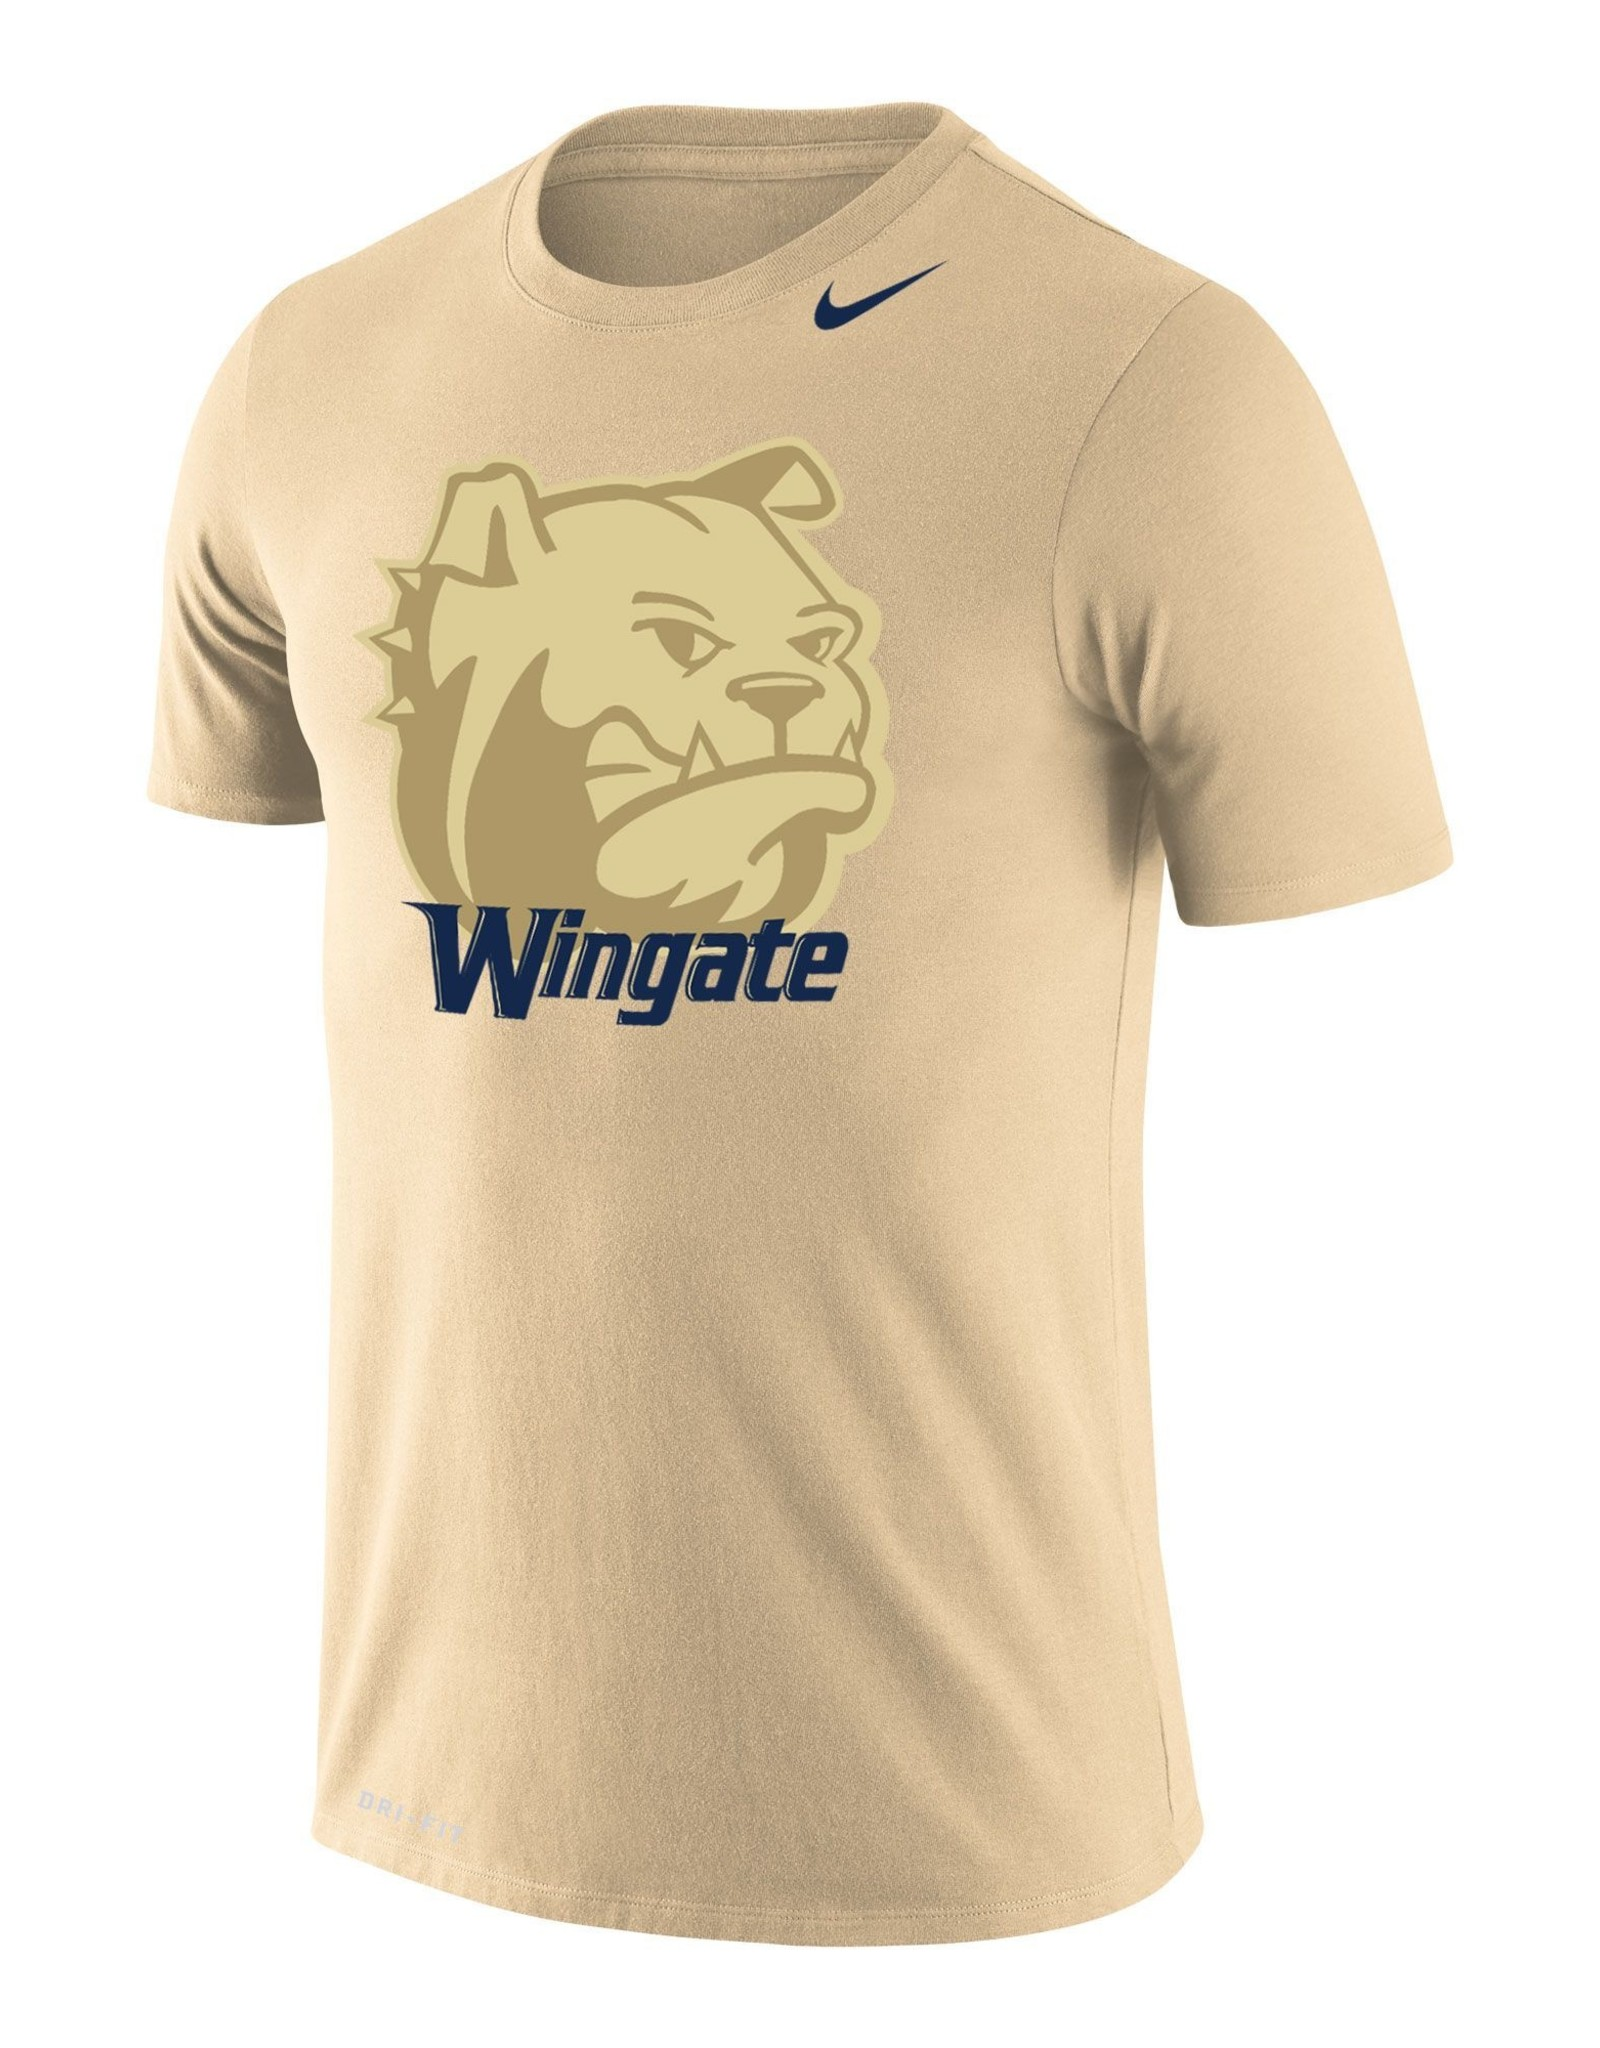 Nike Unisex Vegas Gold Tonal Drifit Cotton Legend SS Tee